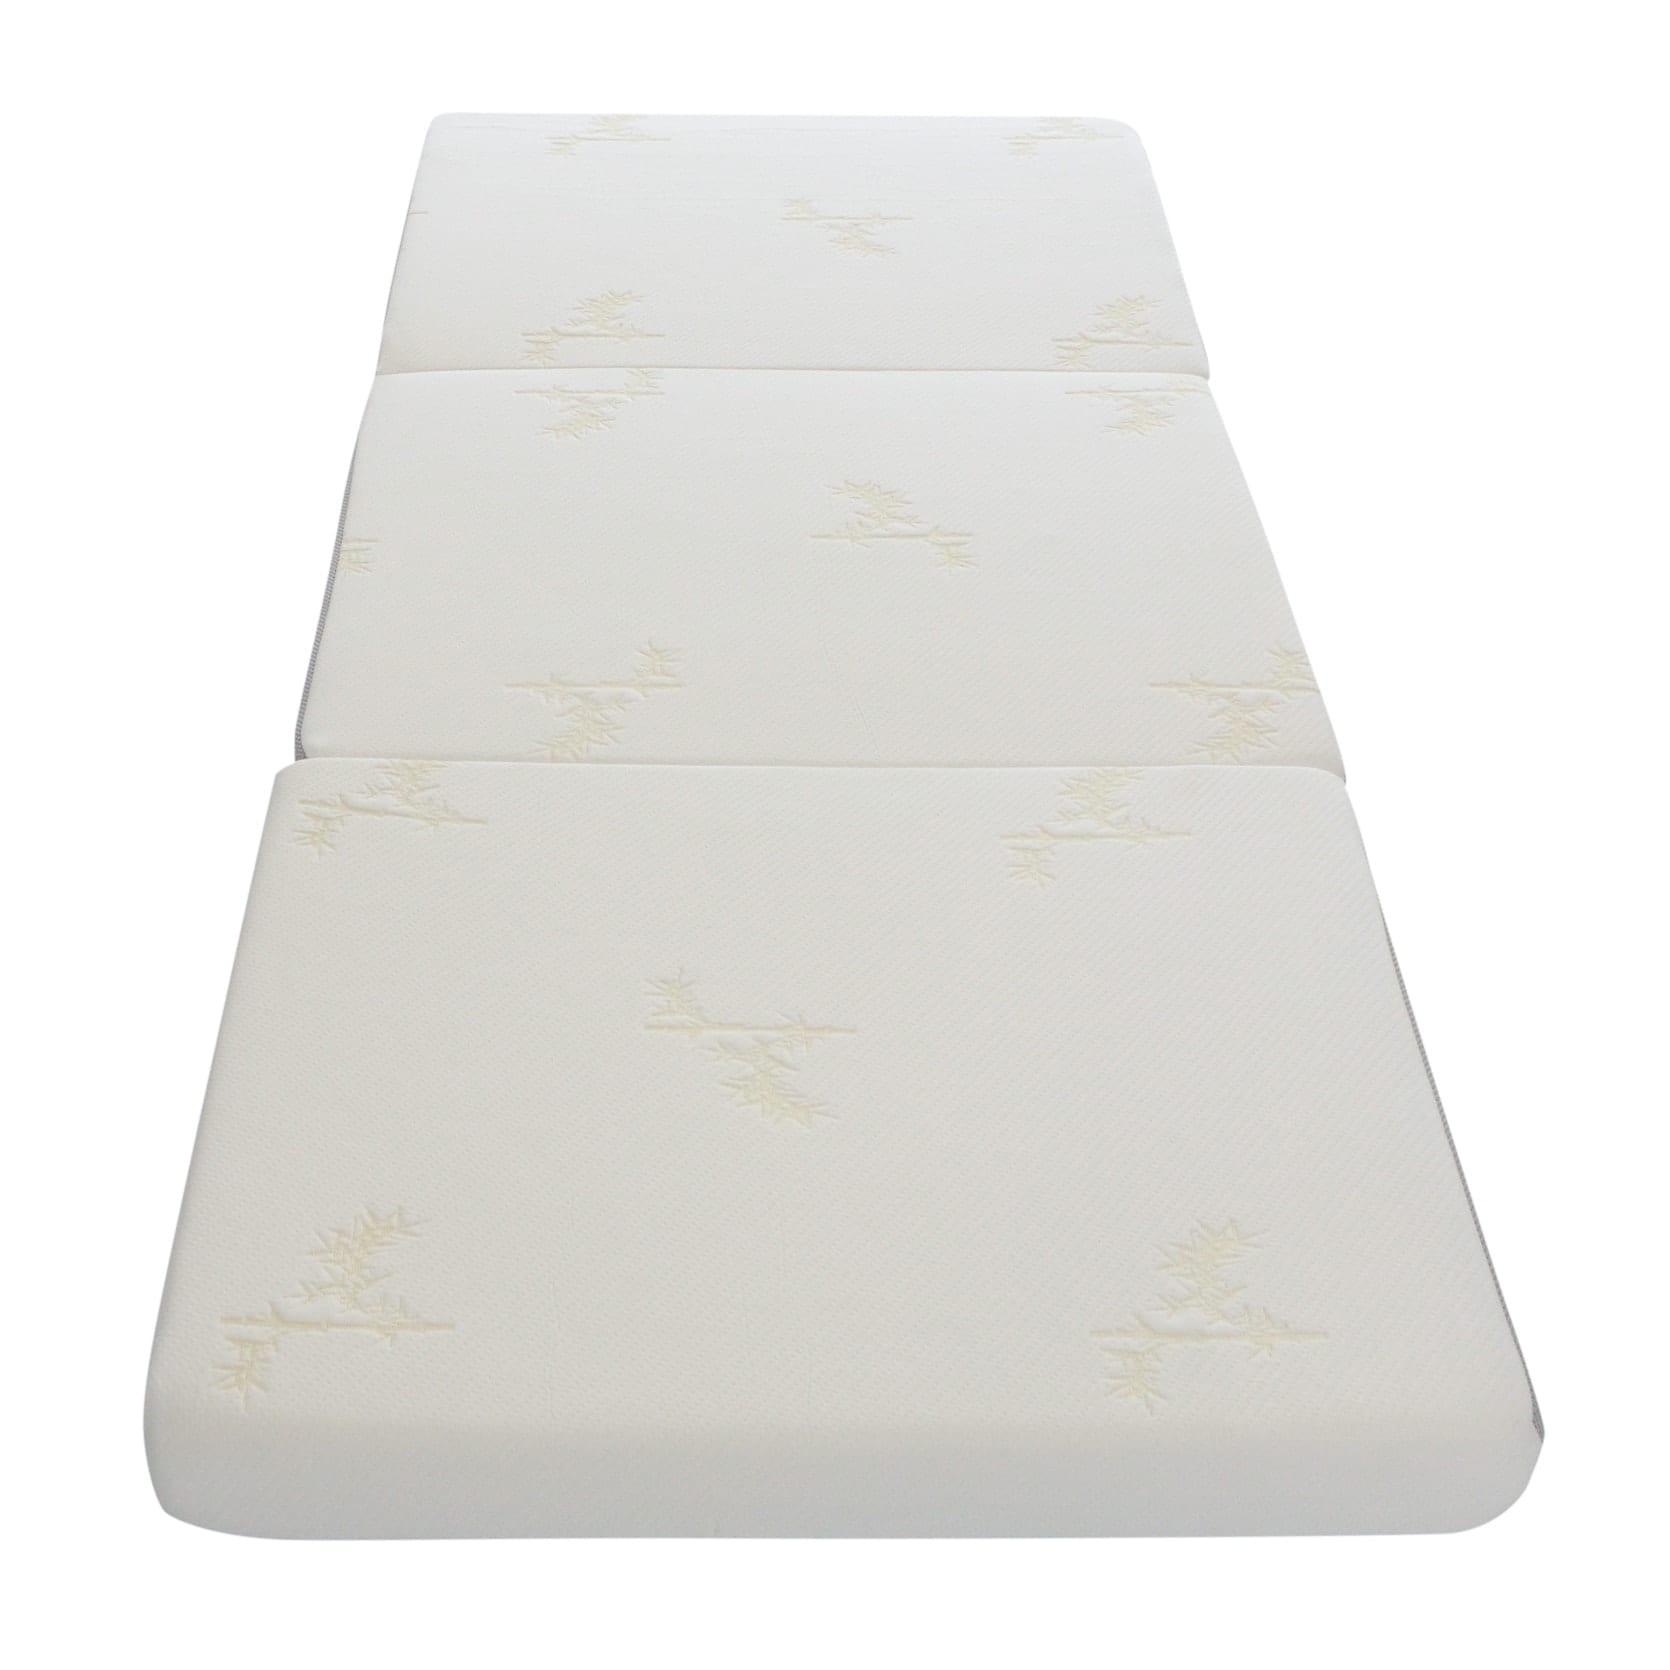 Milliard 4-inch Tri Folding Mattress with Ultra Soft Remo...